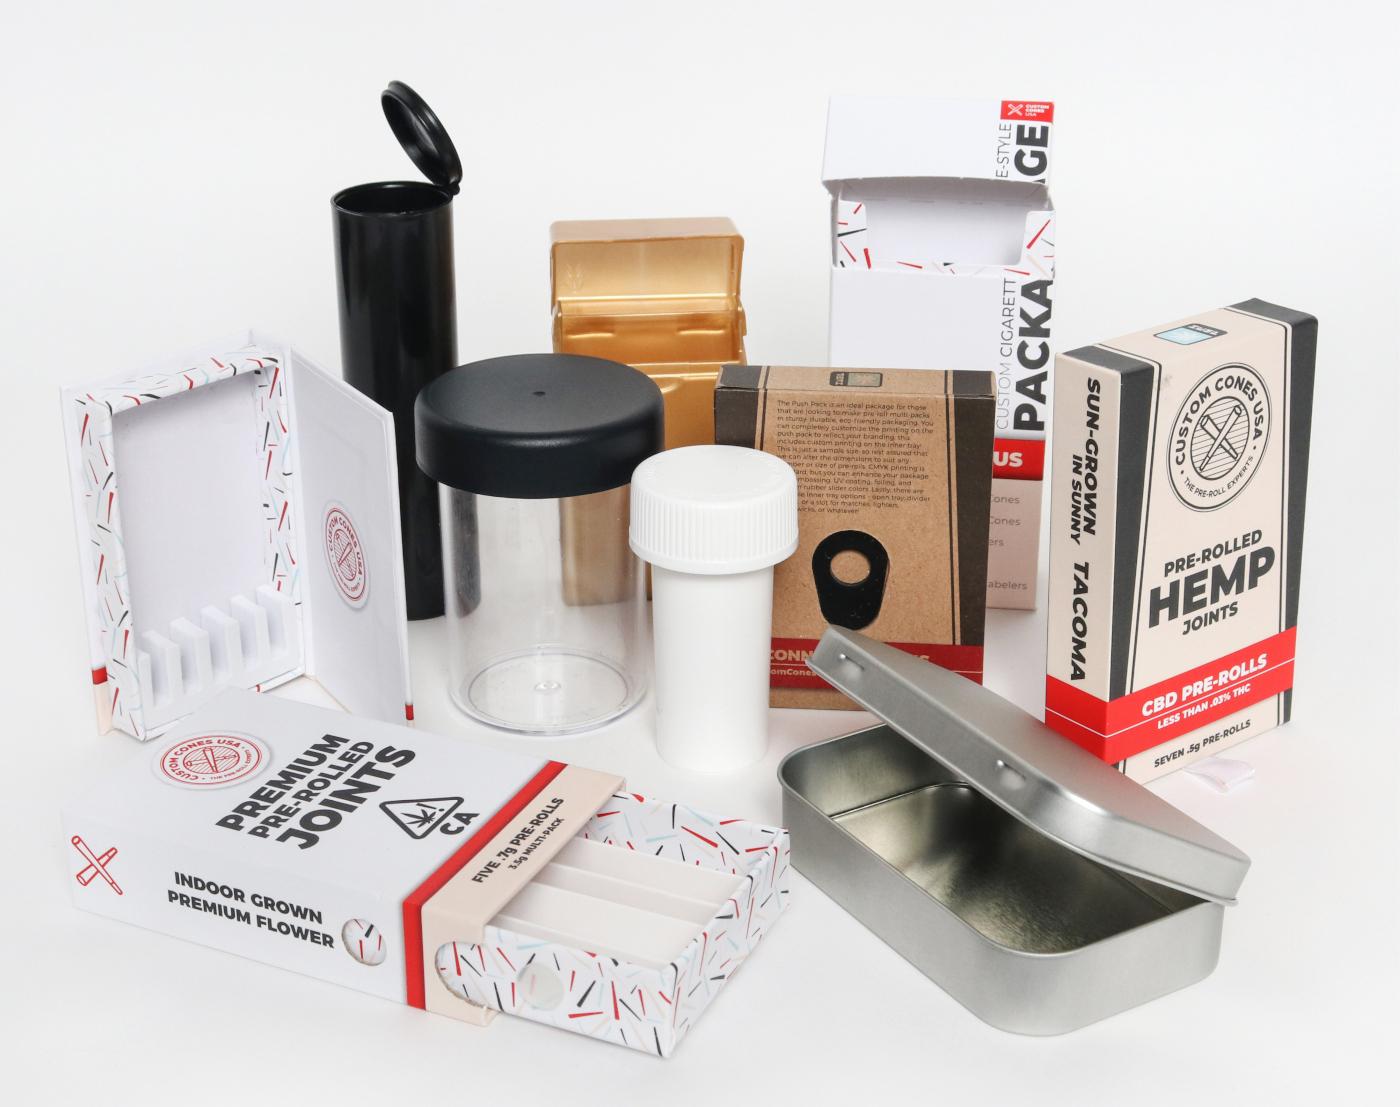 Custom Cones USA CBD packaging mgretailer